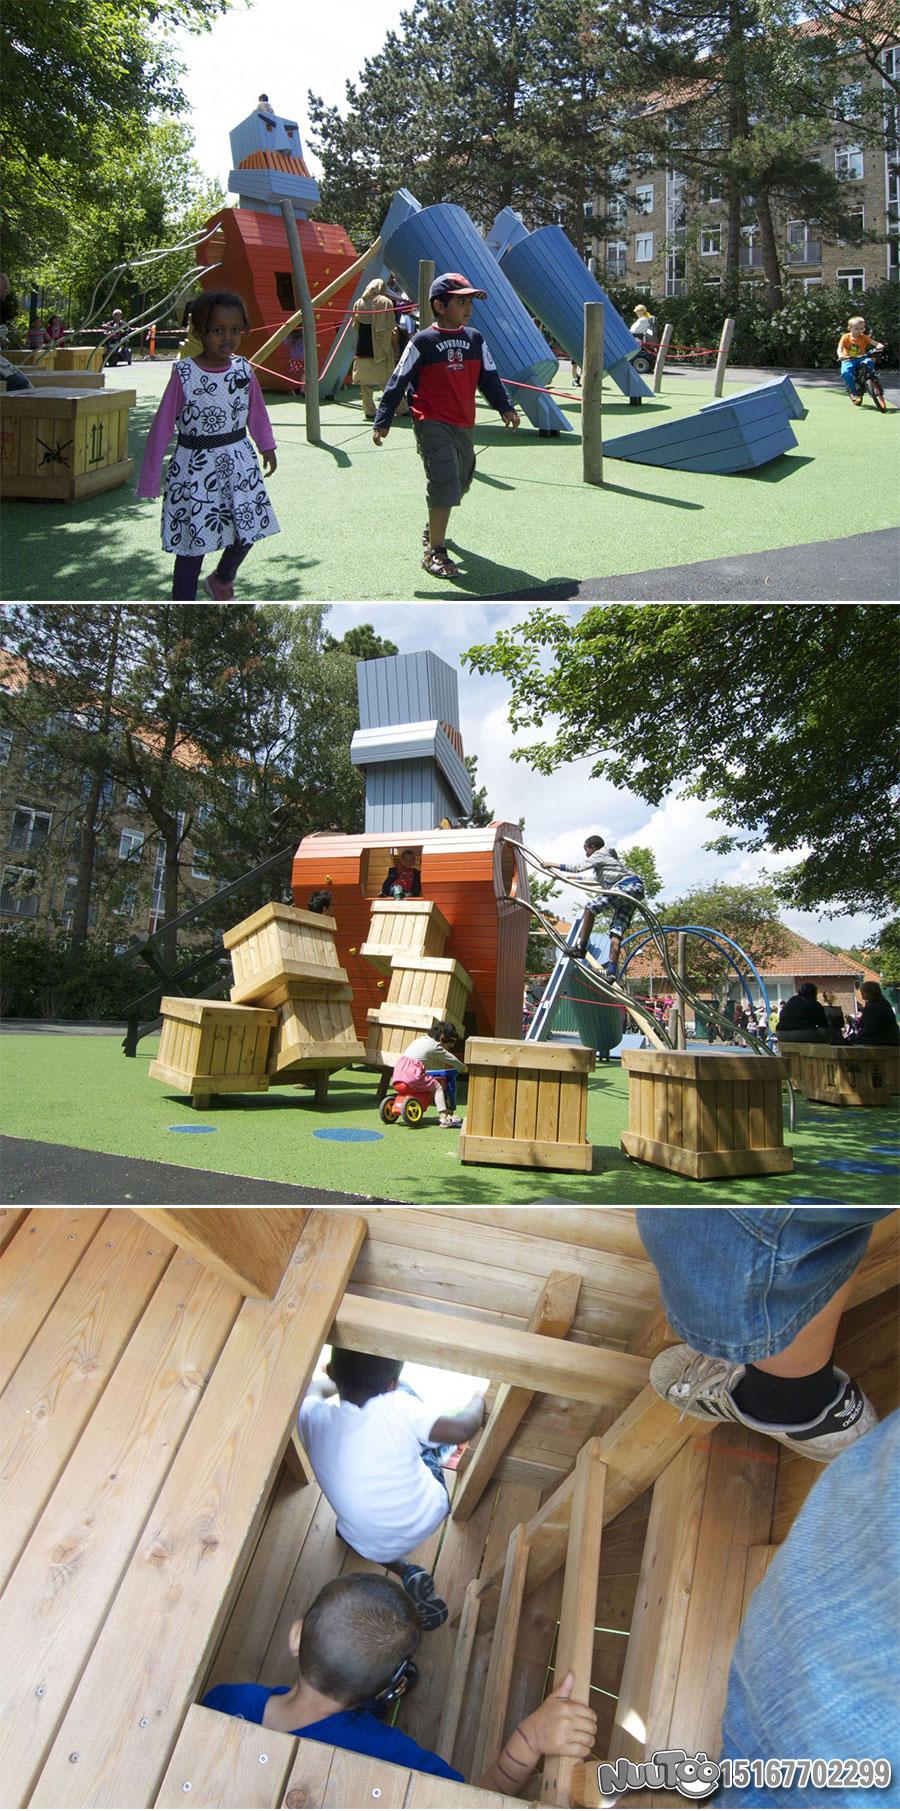 Non-standard amusement + personalized playground + amusement equipment + rides + outdoor children's play facilities _14